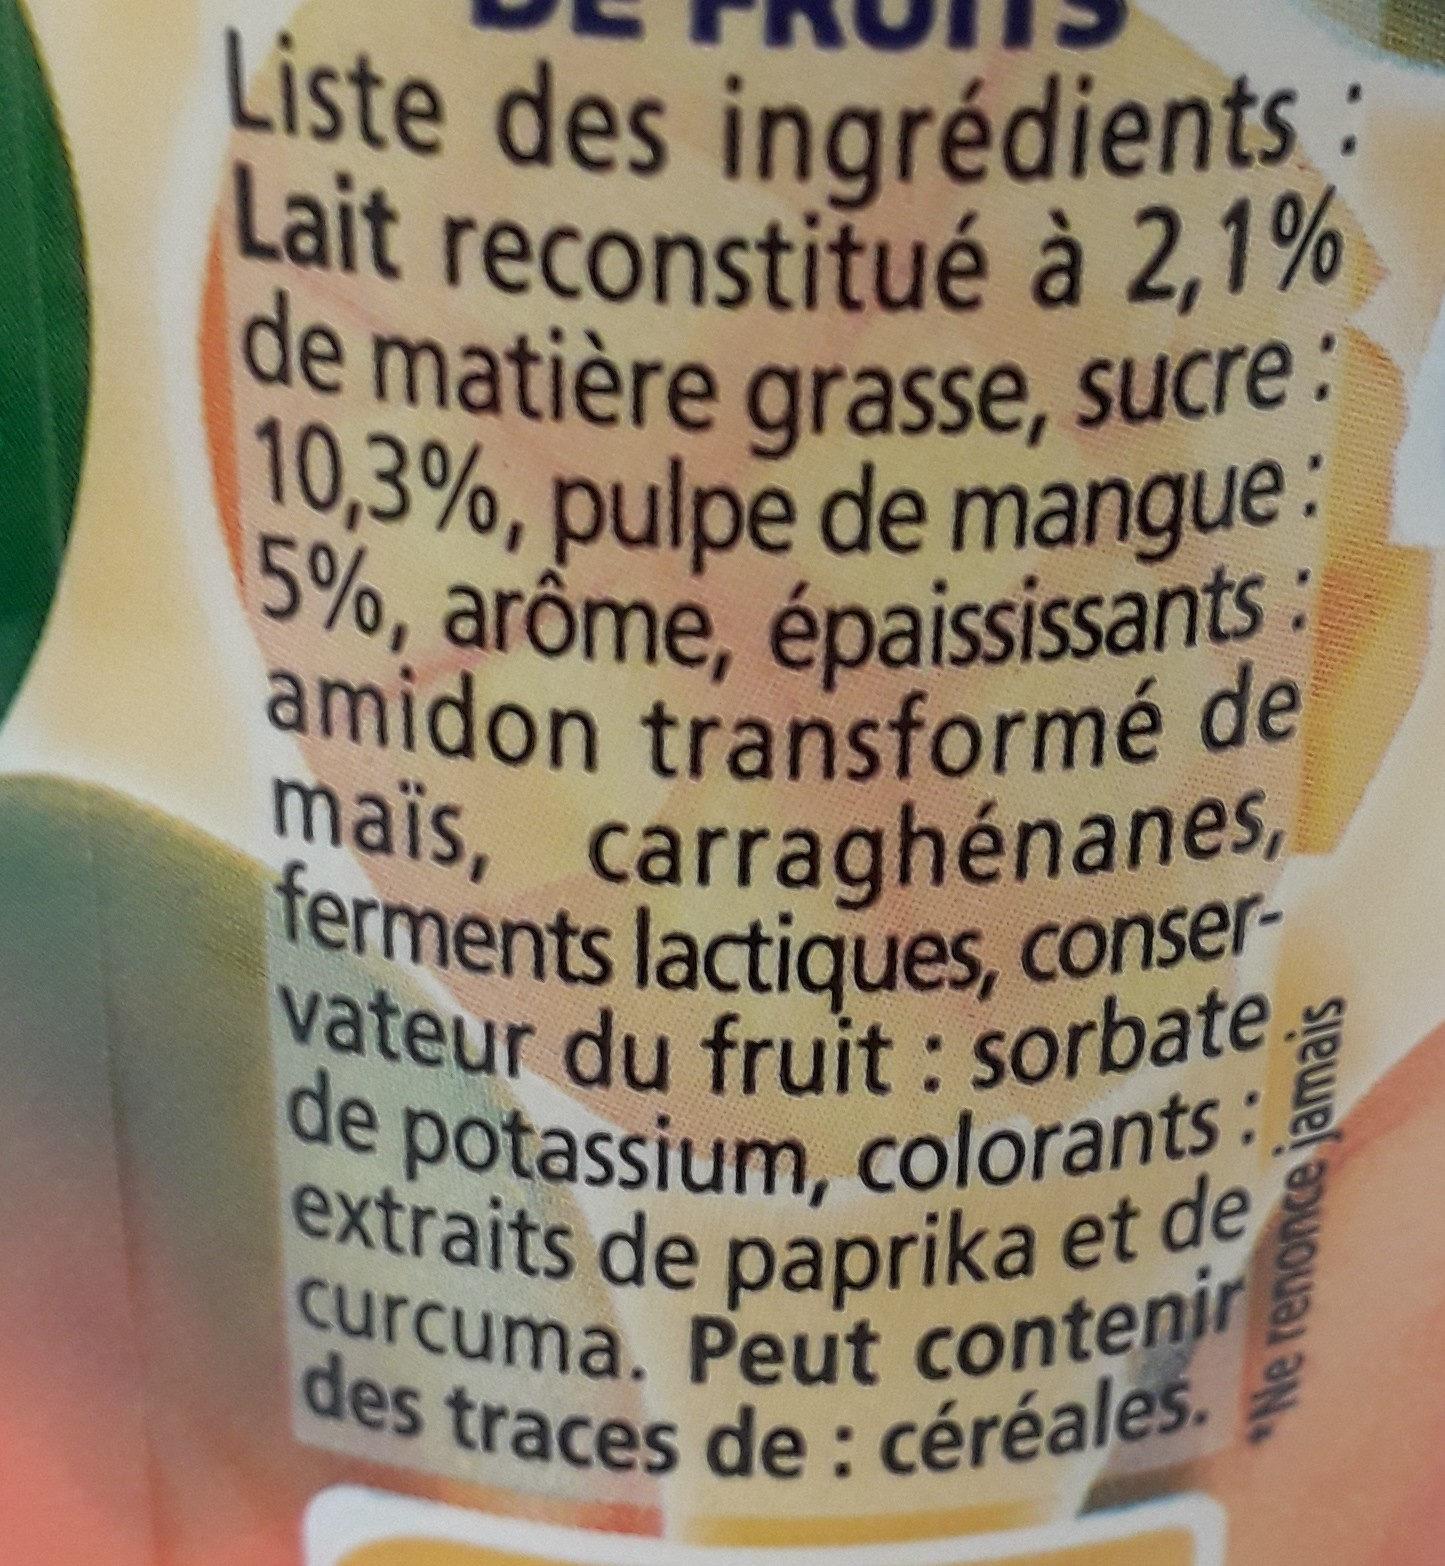 Yaourts à boire à la pulpe de mangue Yop mangue - Ingrediënten - fr